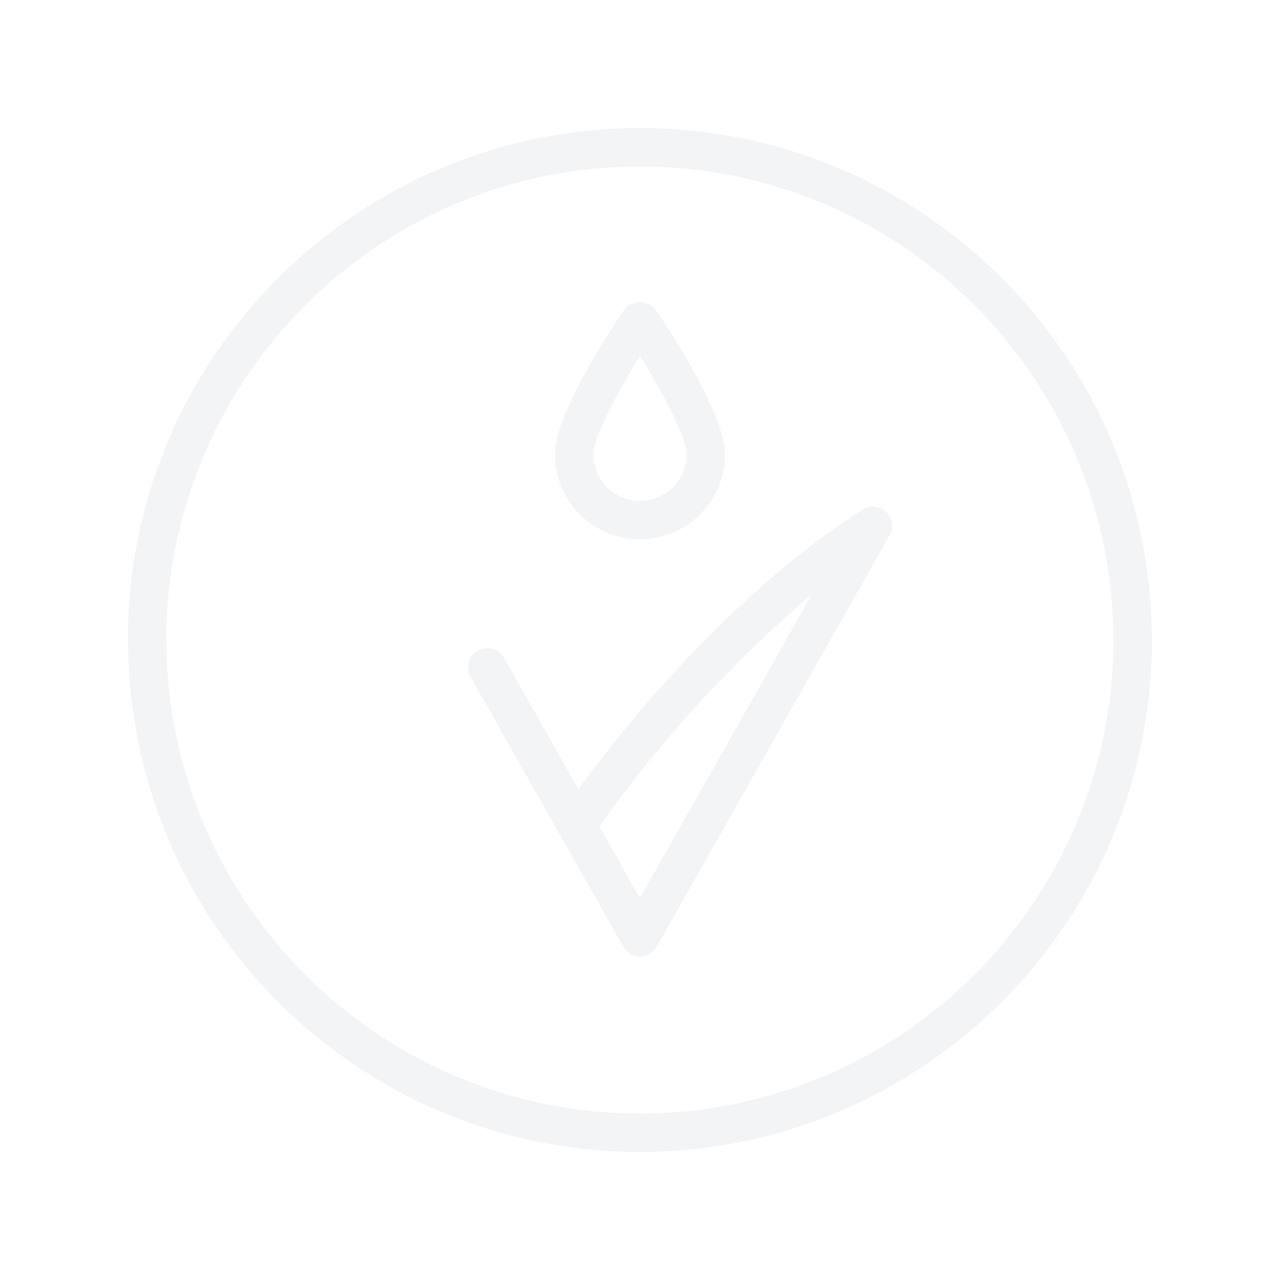 Clarins Multi-Active Antioxidant Day Cream-Gel (Normal/Combination) 50ml